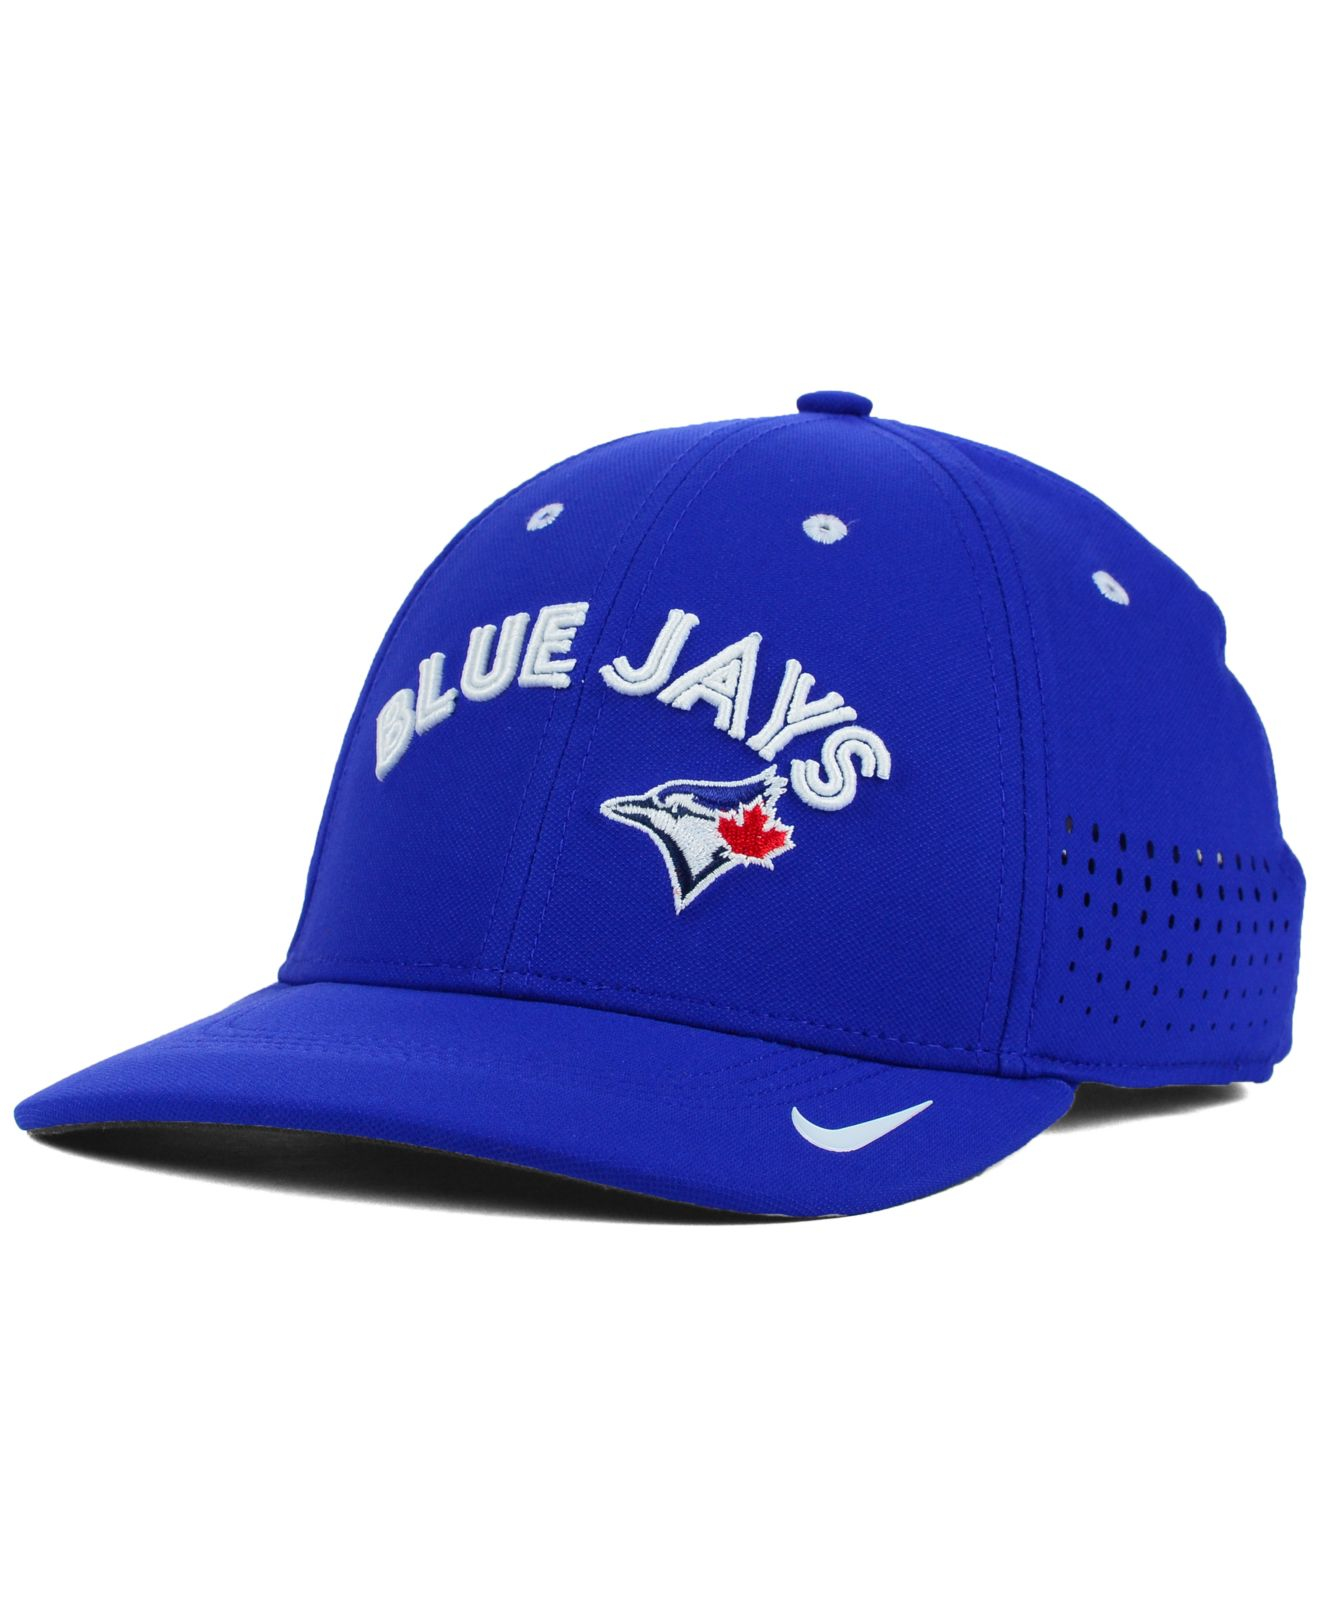 208403a16535 Lyst - Nike Toronto Blue Jays Vapor Swoosh Flex Cap in Blue for Men